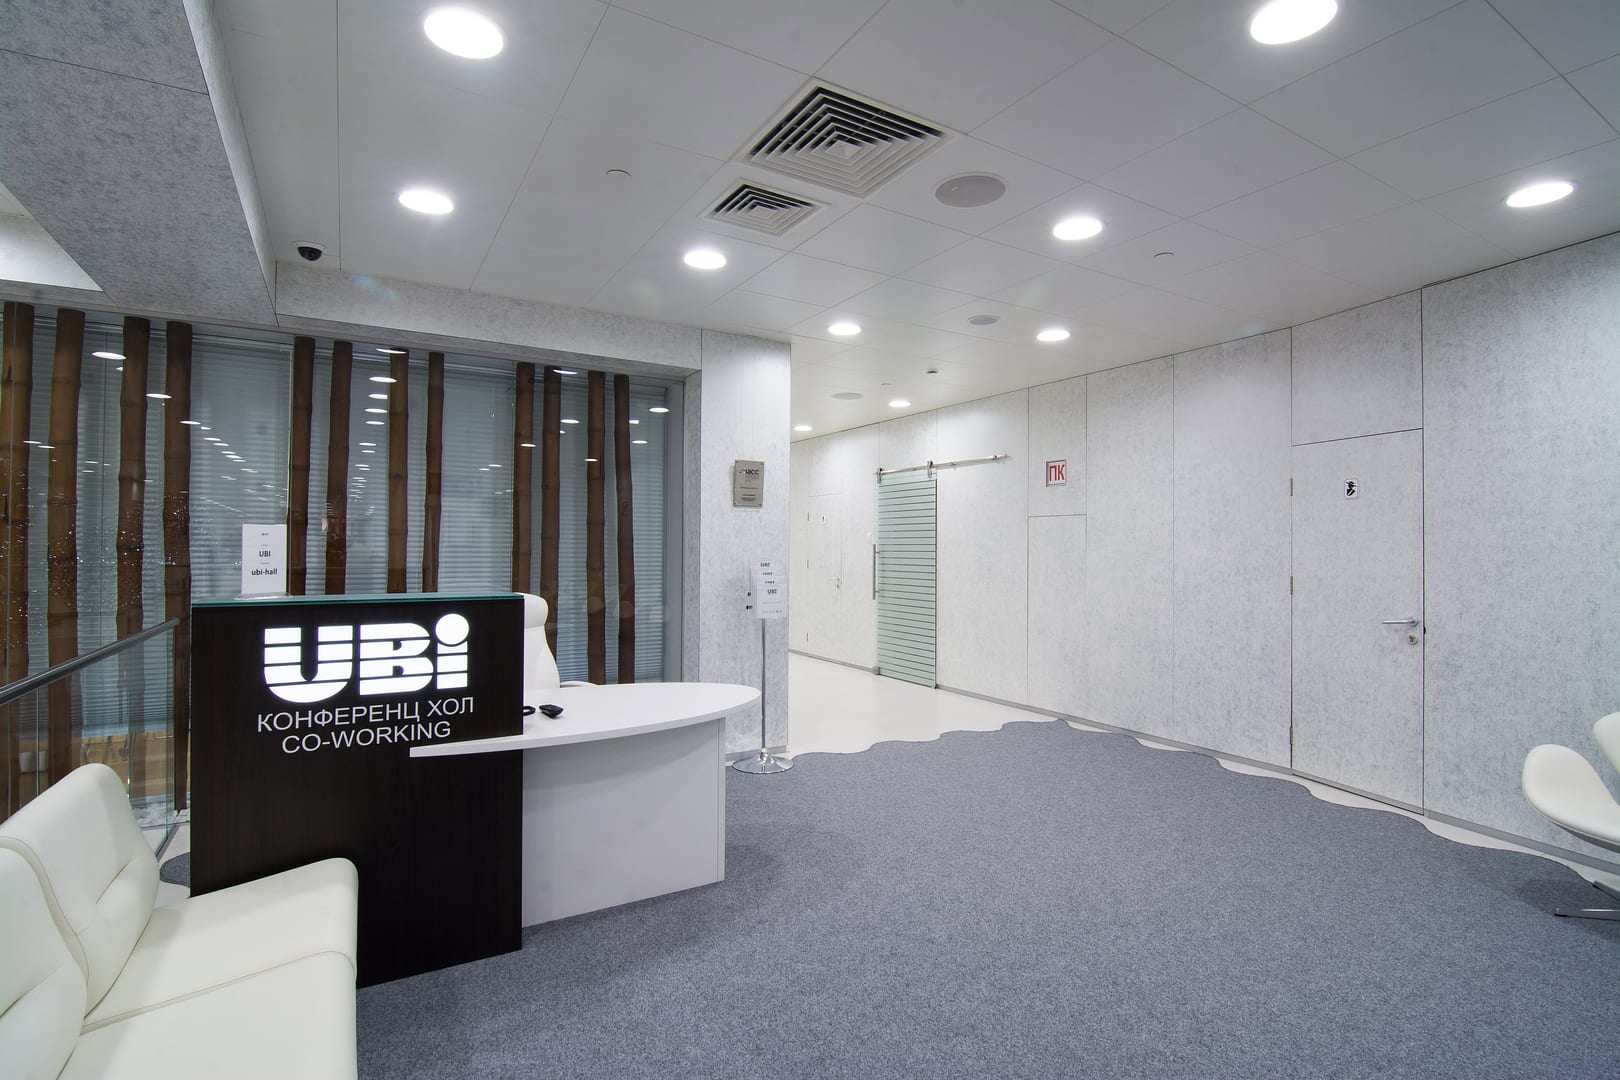 UBI Conference Hall